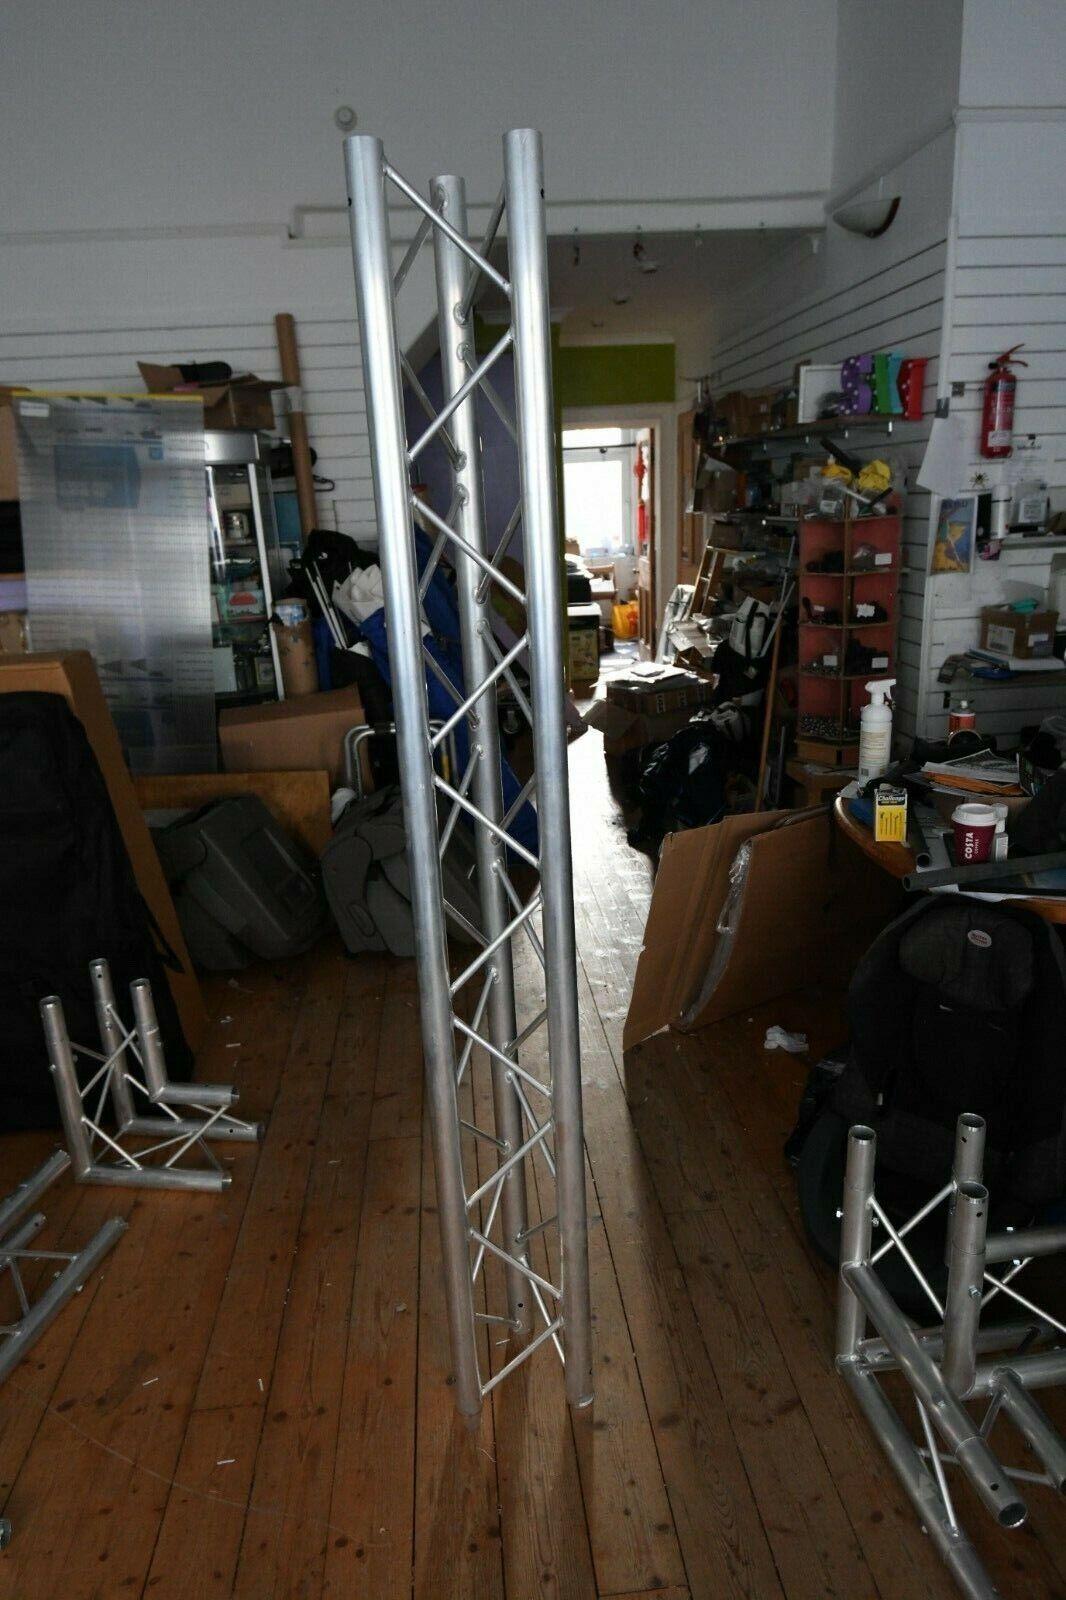 Opti Trilite 200 Triangular Truss Exhibition or Stage Lighting - 4x3m stand set